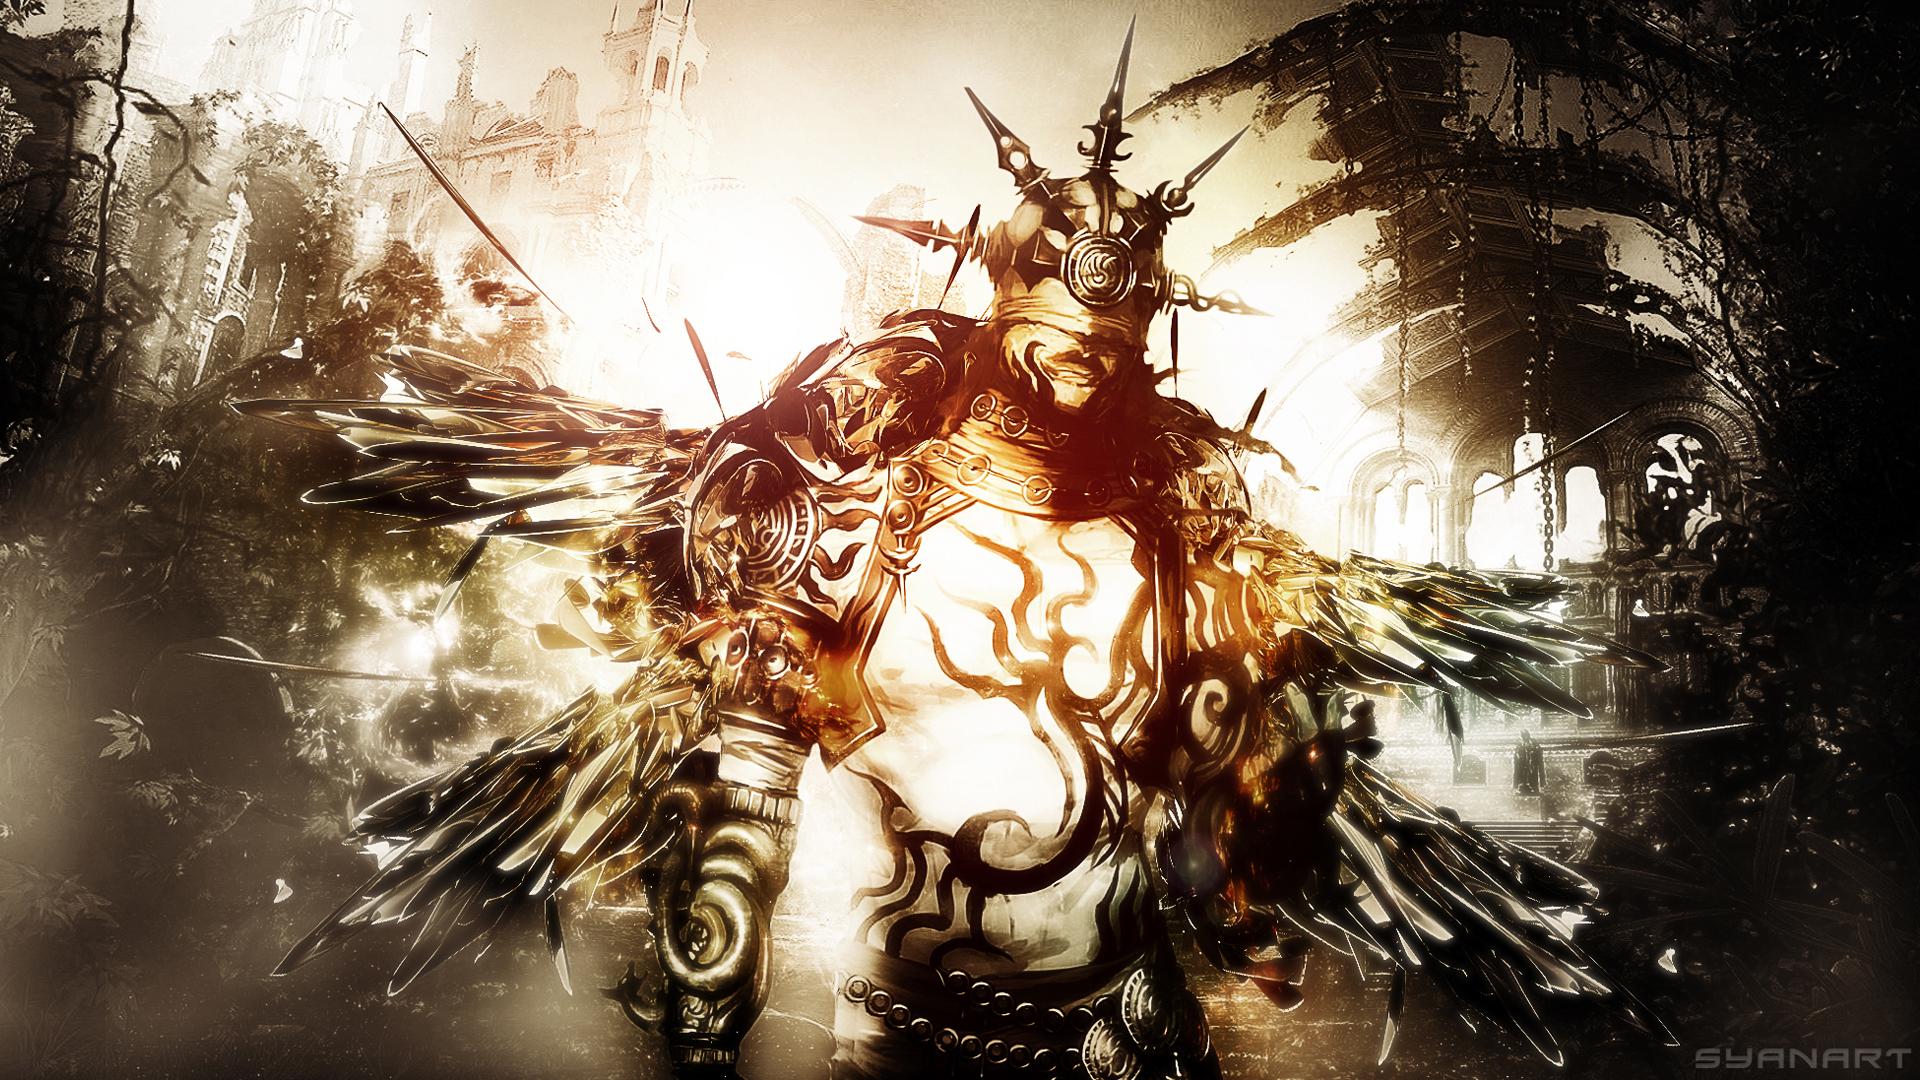 Guild Wars 2 Fullhd Godlike Wallpaper Syanart Station